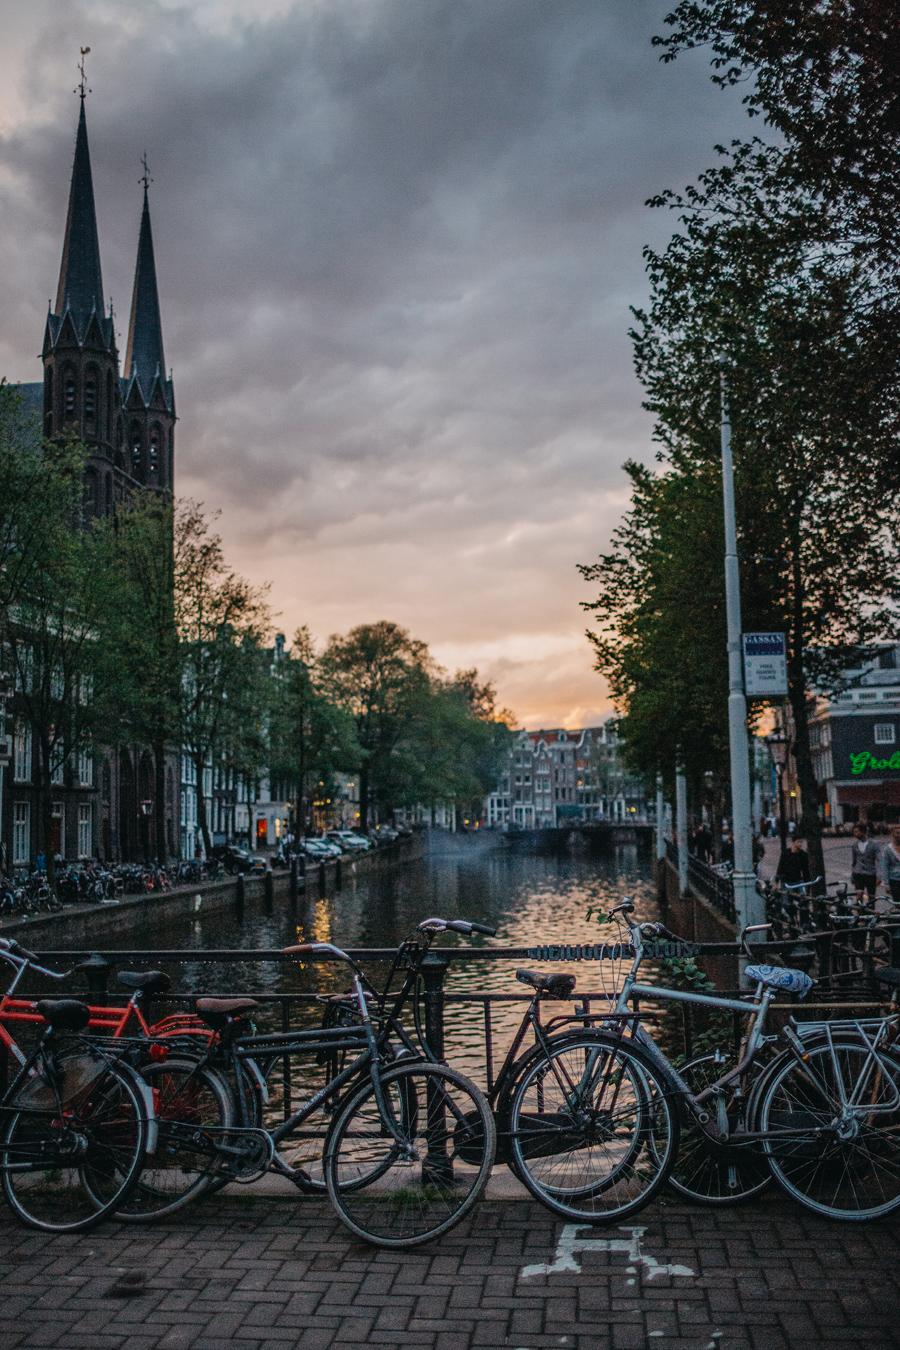 019-amsterdam-bikes-travel-photography.jpg